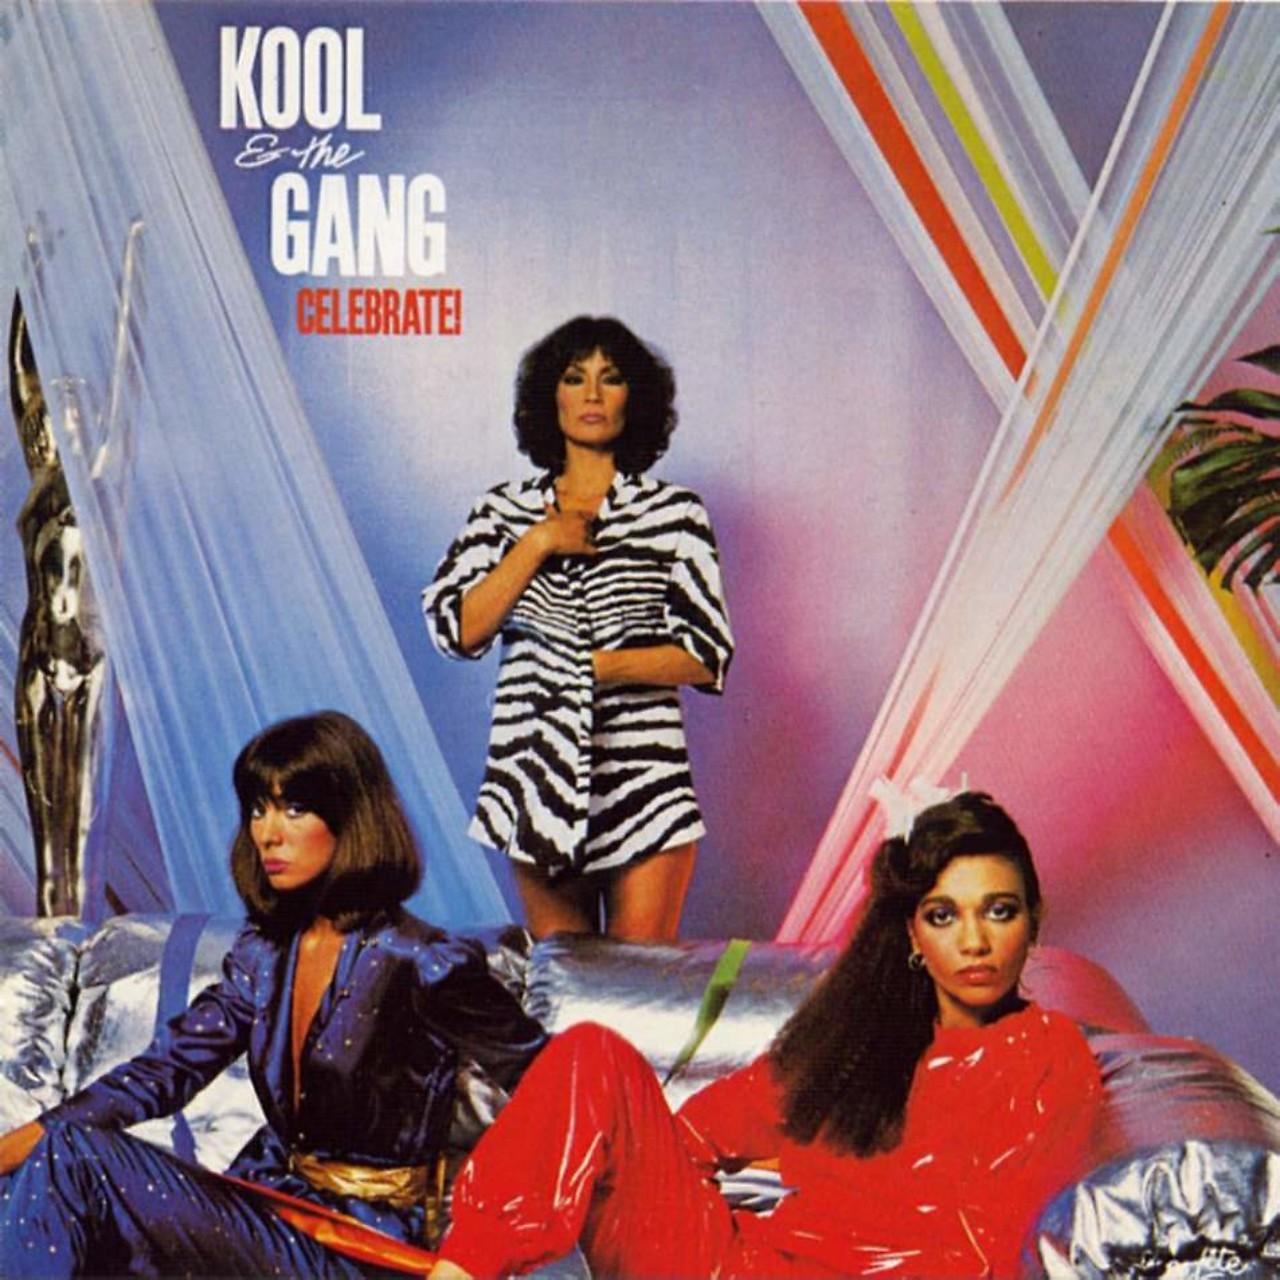 Kool & the gang download celebration: the best of kool & the.